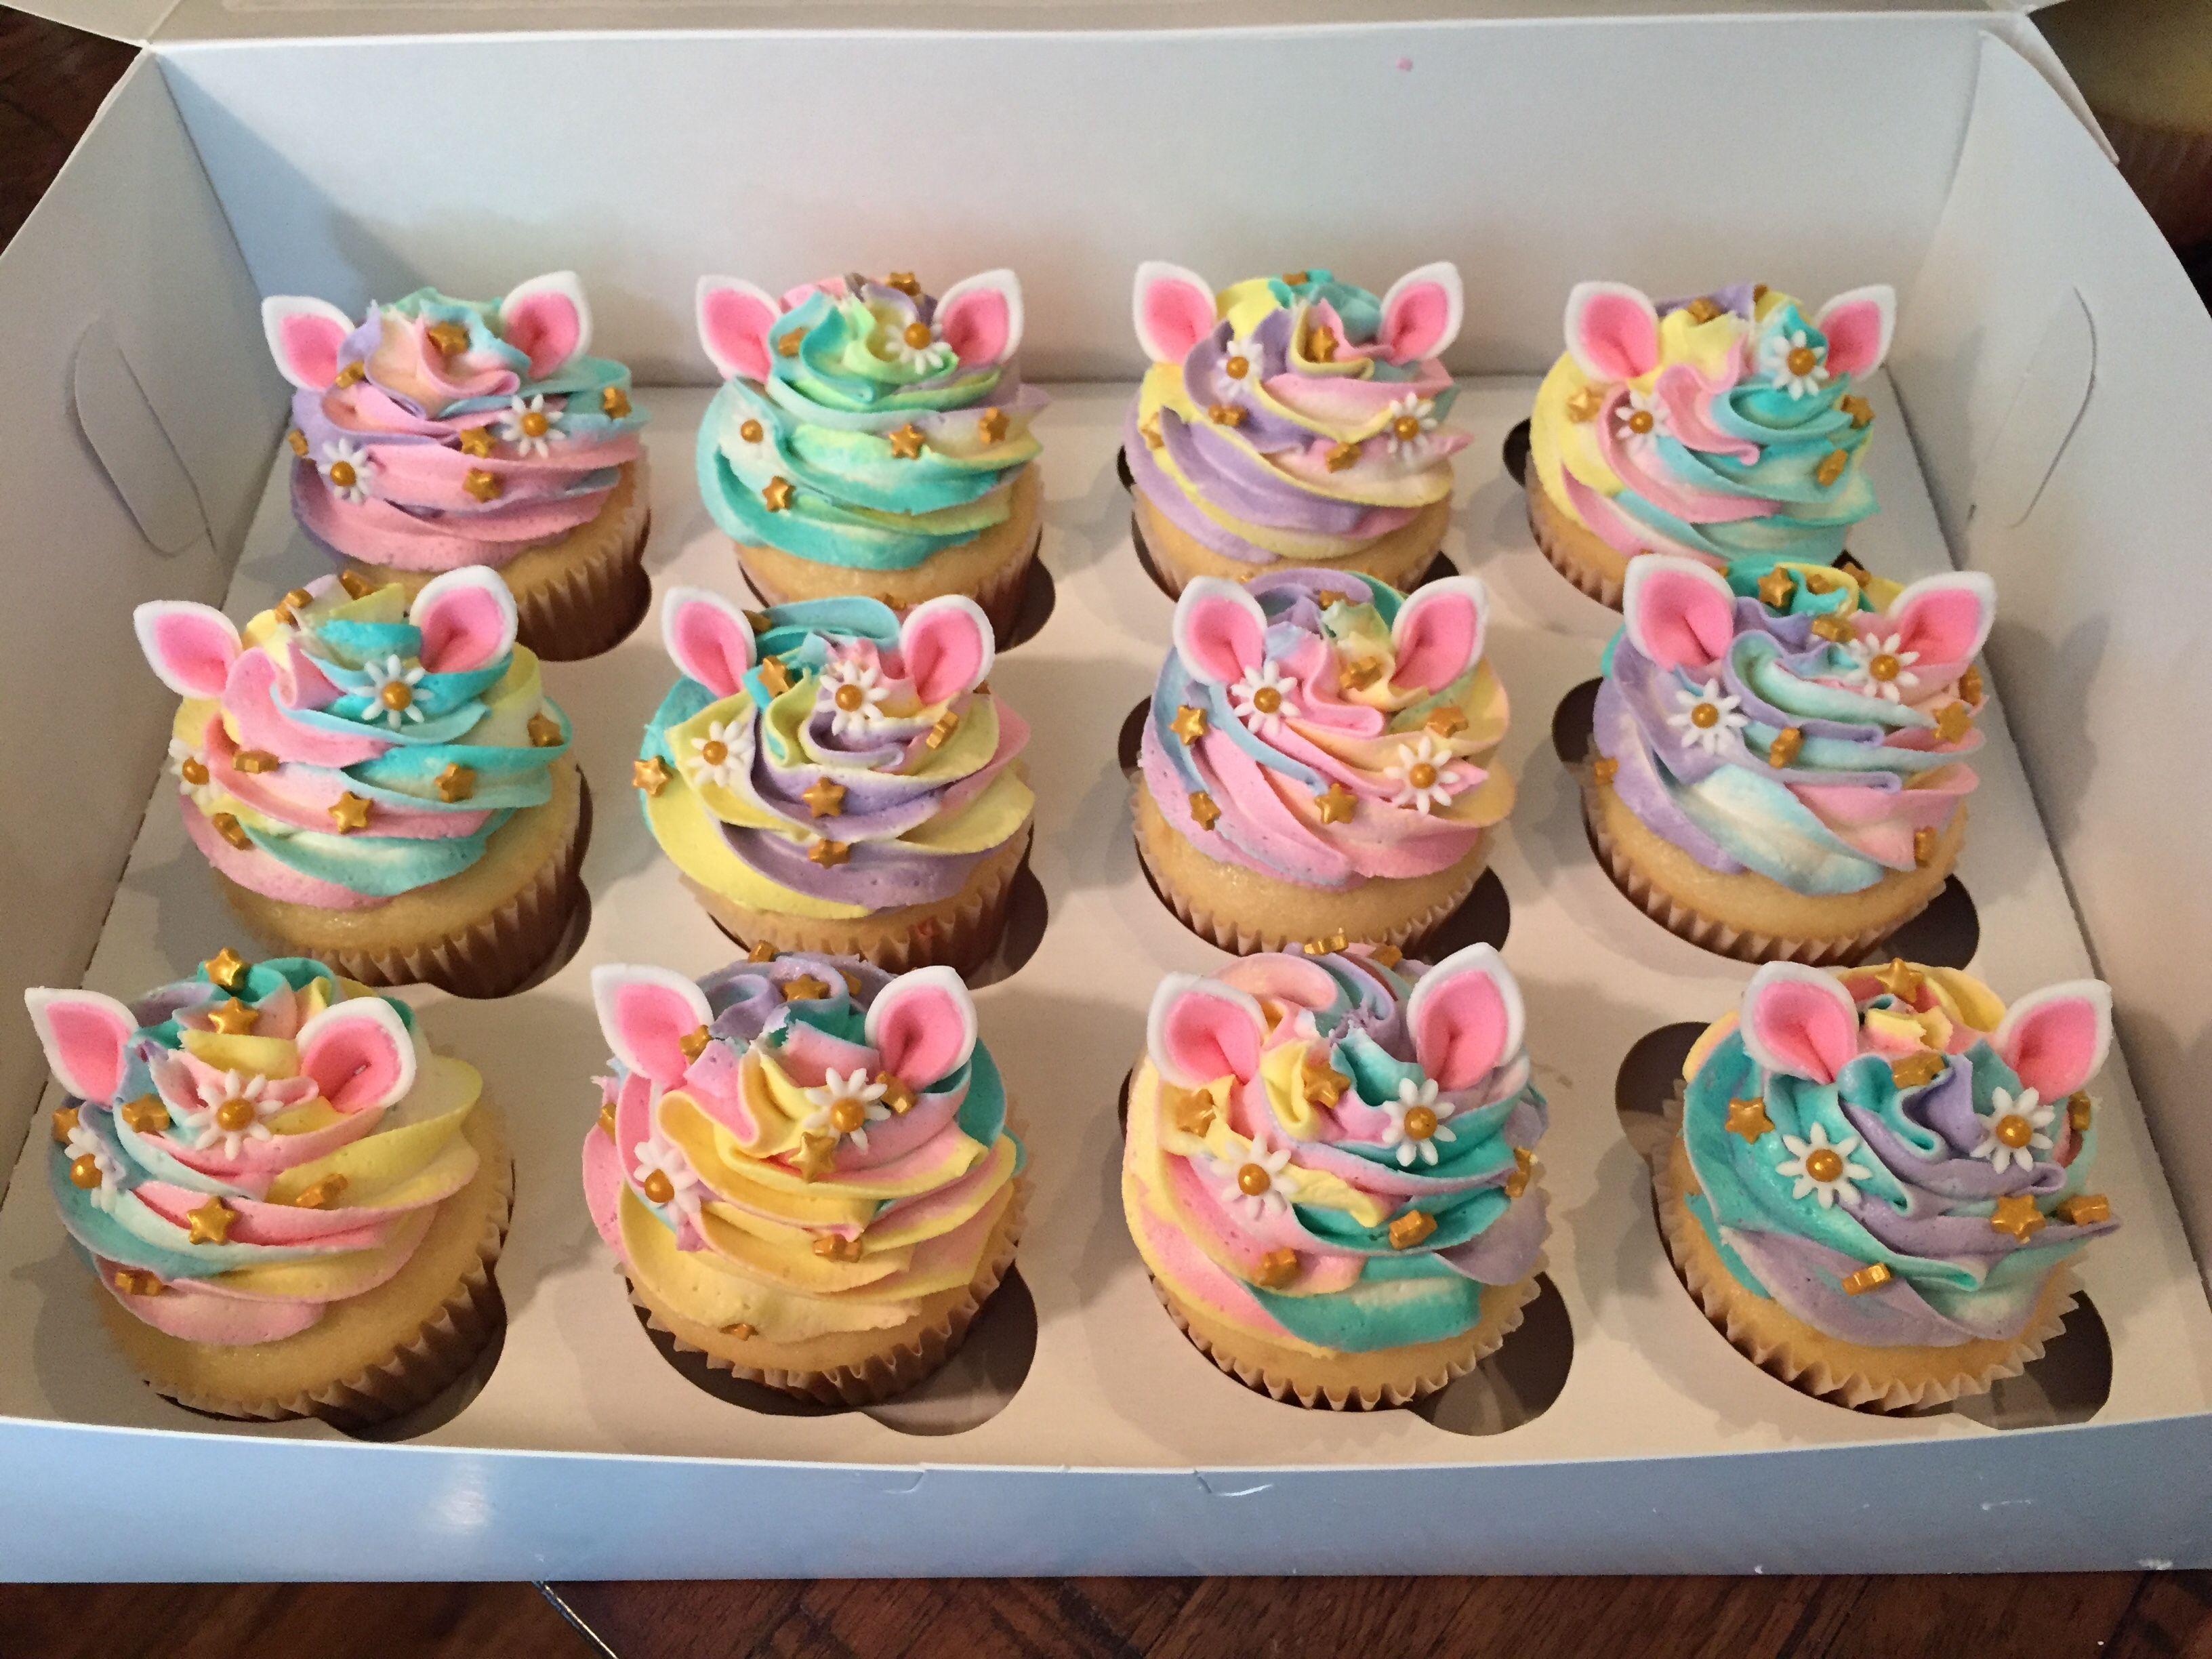 Post Horn Unicorn Cupcakes Birthday Cakes For Teens Unicorn Cupcakes Unicorn Birthday Parties